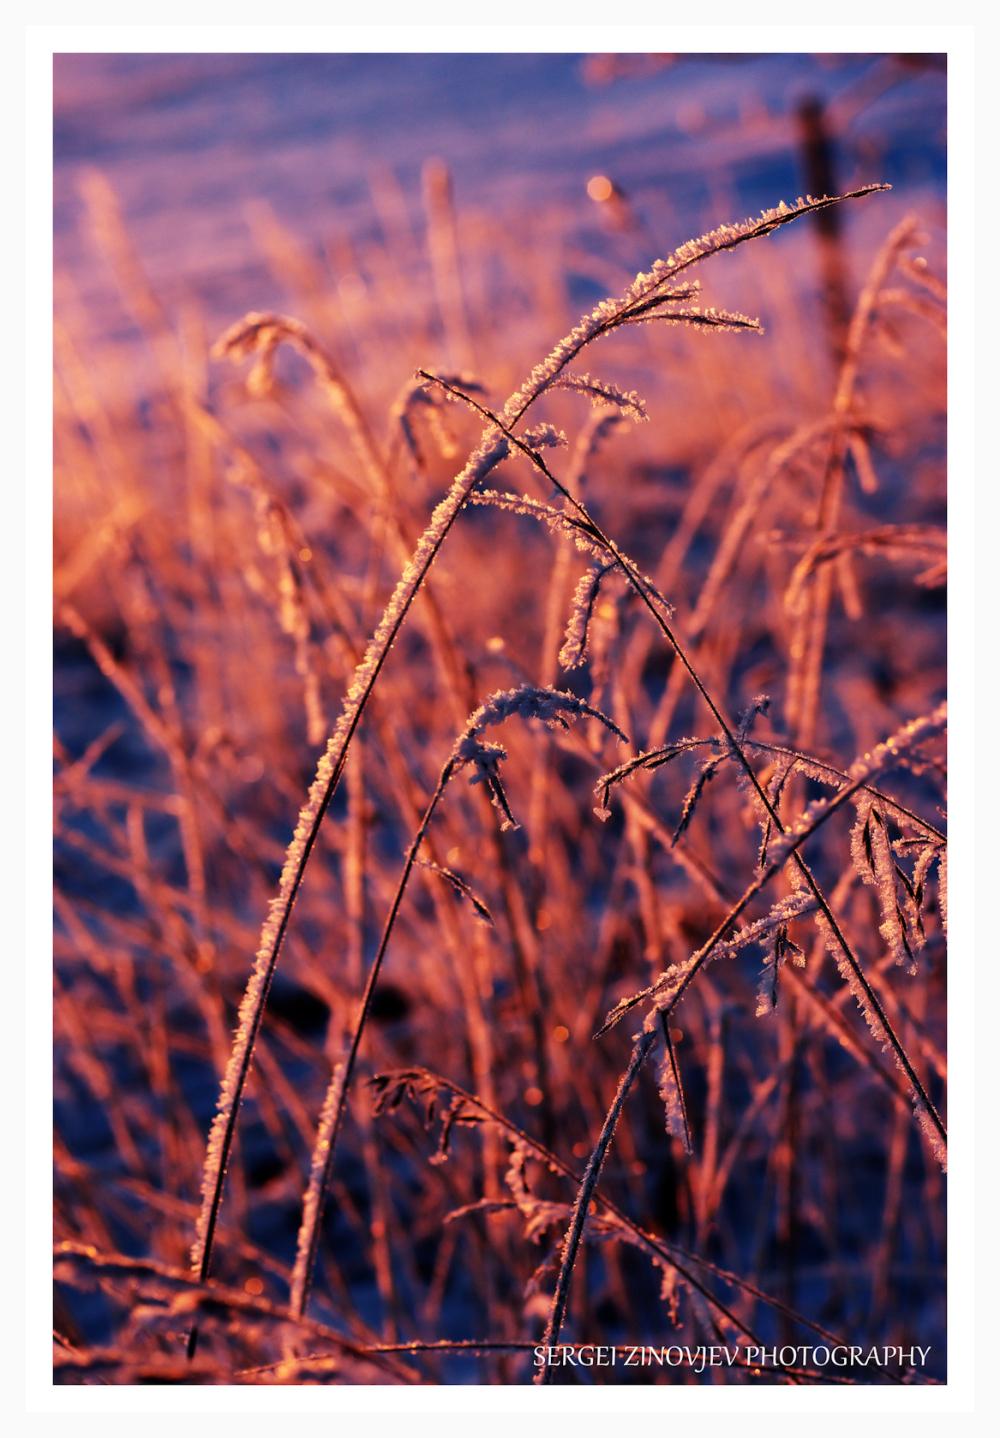 morning light at frozen grass